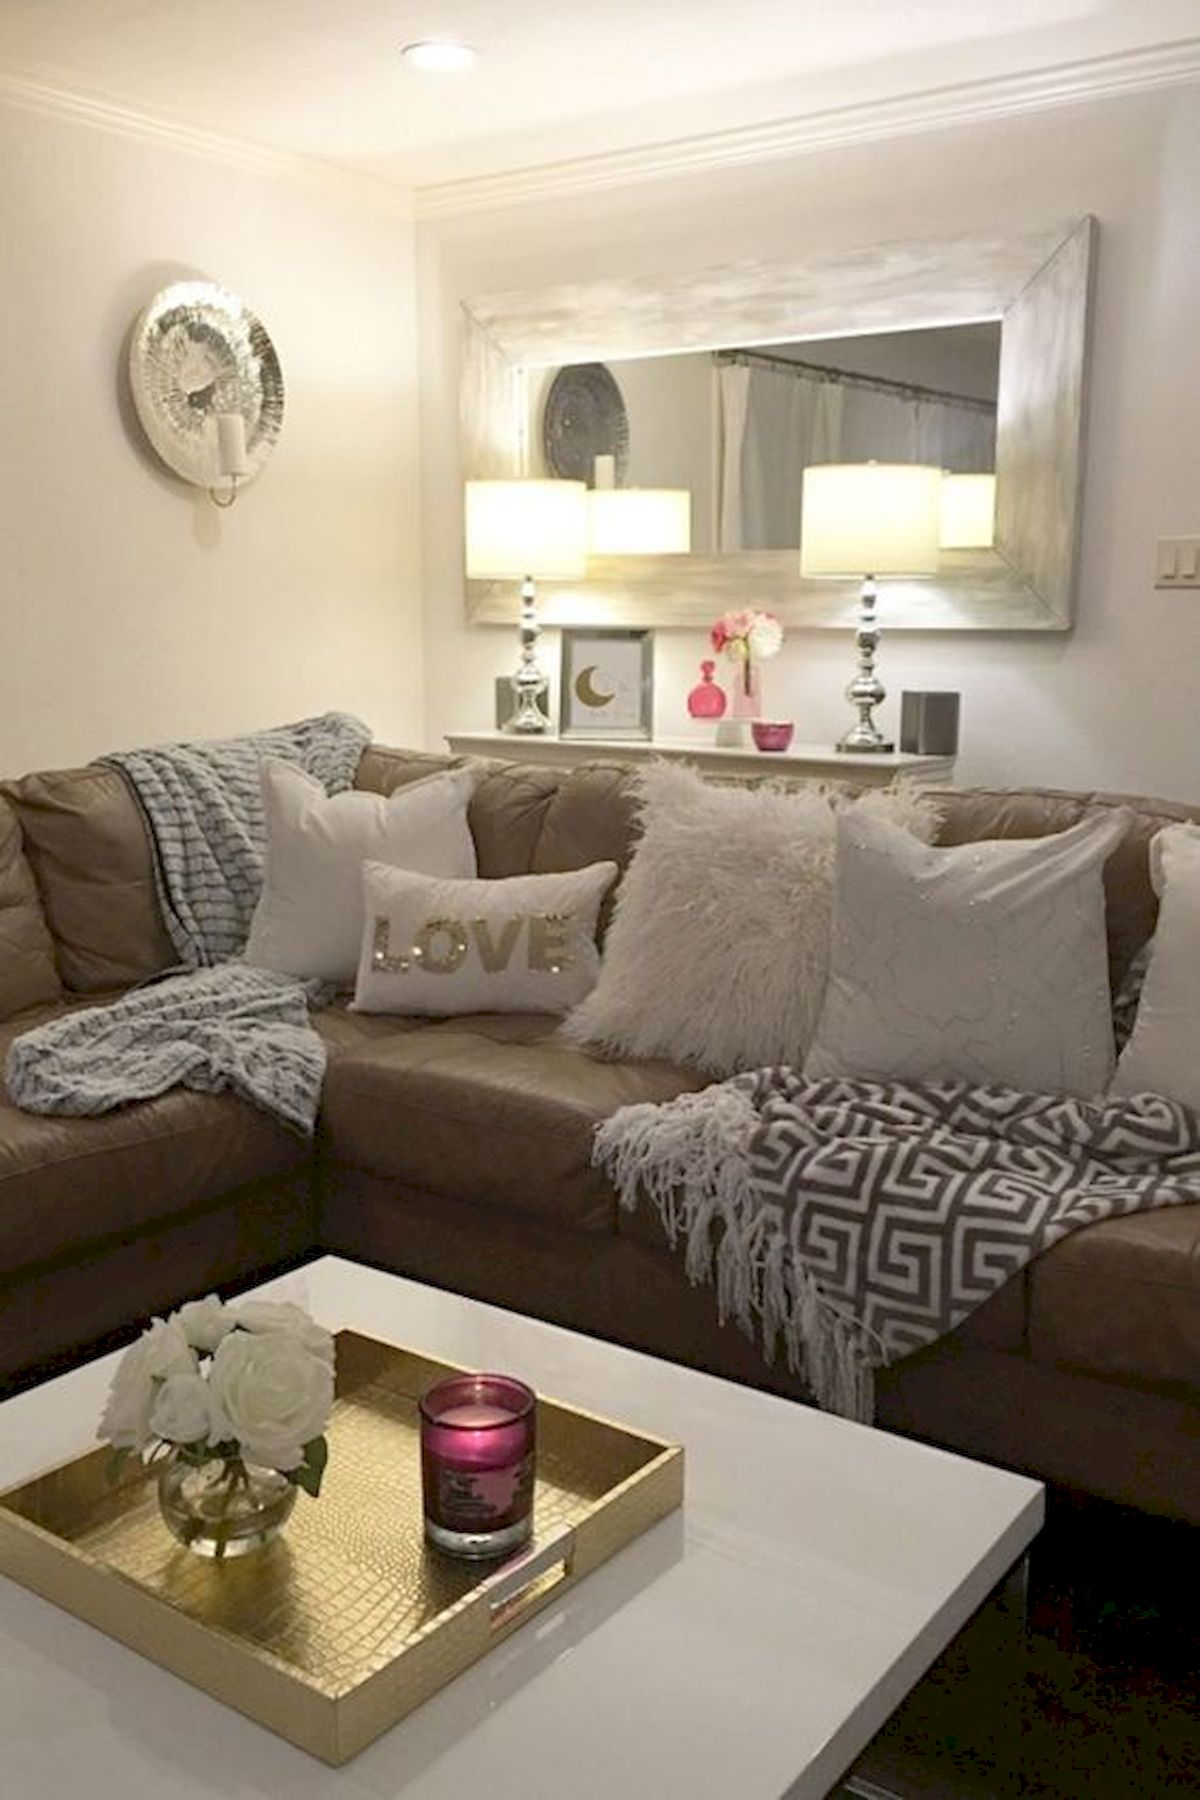 50 Gorgeous Living Room Decor and Design Ideas (37)